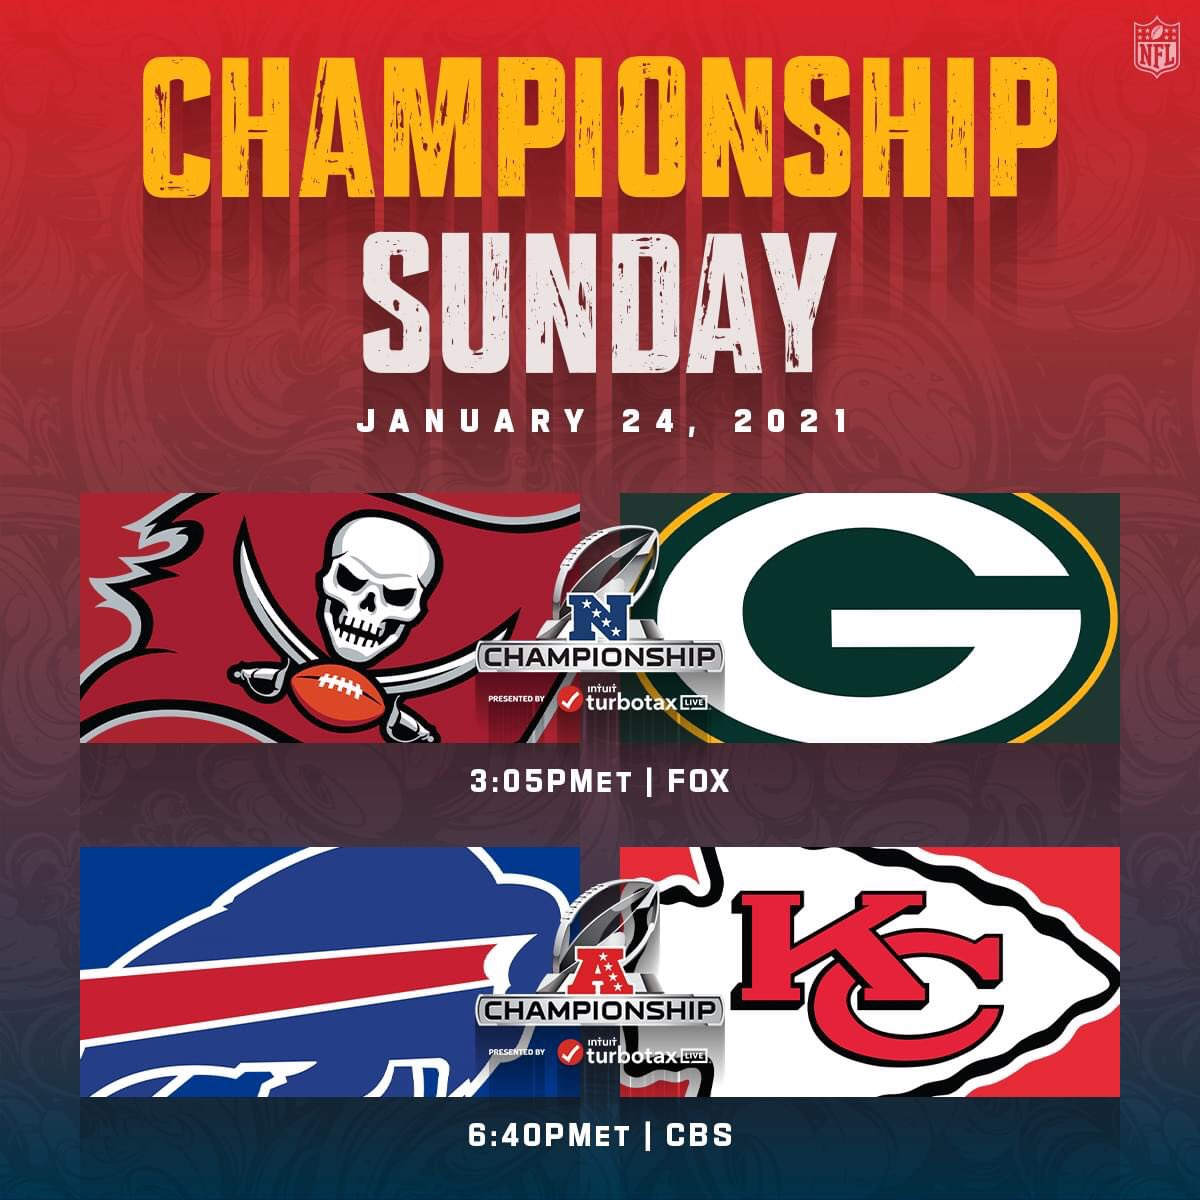 Who's winning today? #GoBucs vs #GoPackGo and #BillsMafia vs #ChiefsKingdom #NFCChampionship #AFCChampionship #ChampionshipSunday